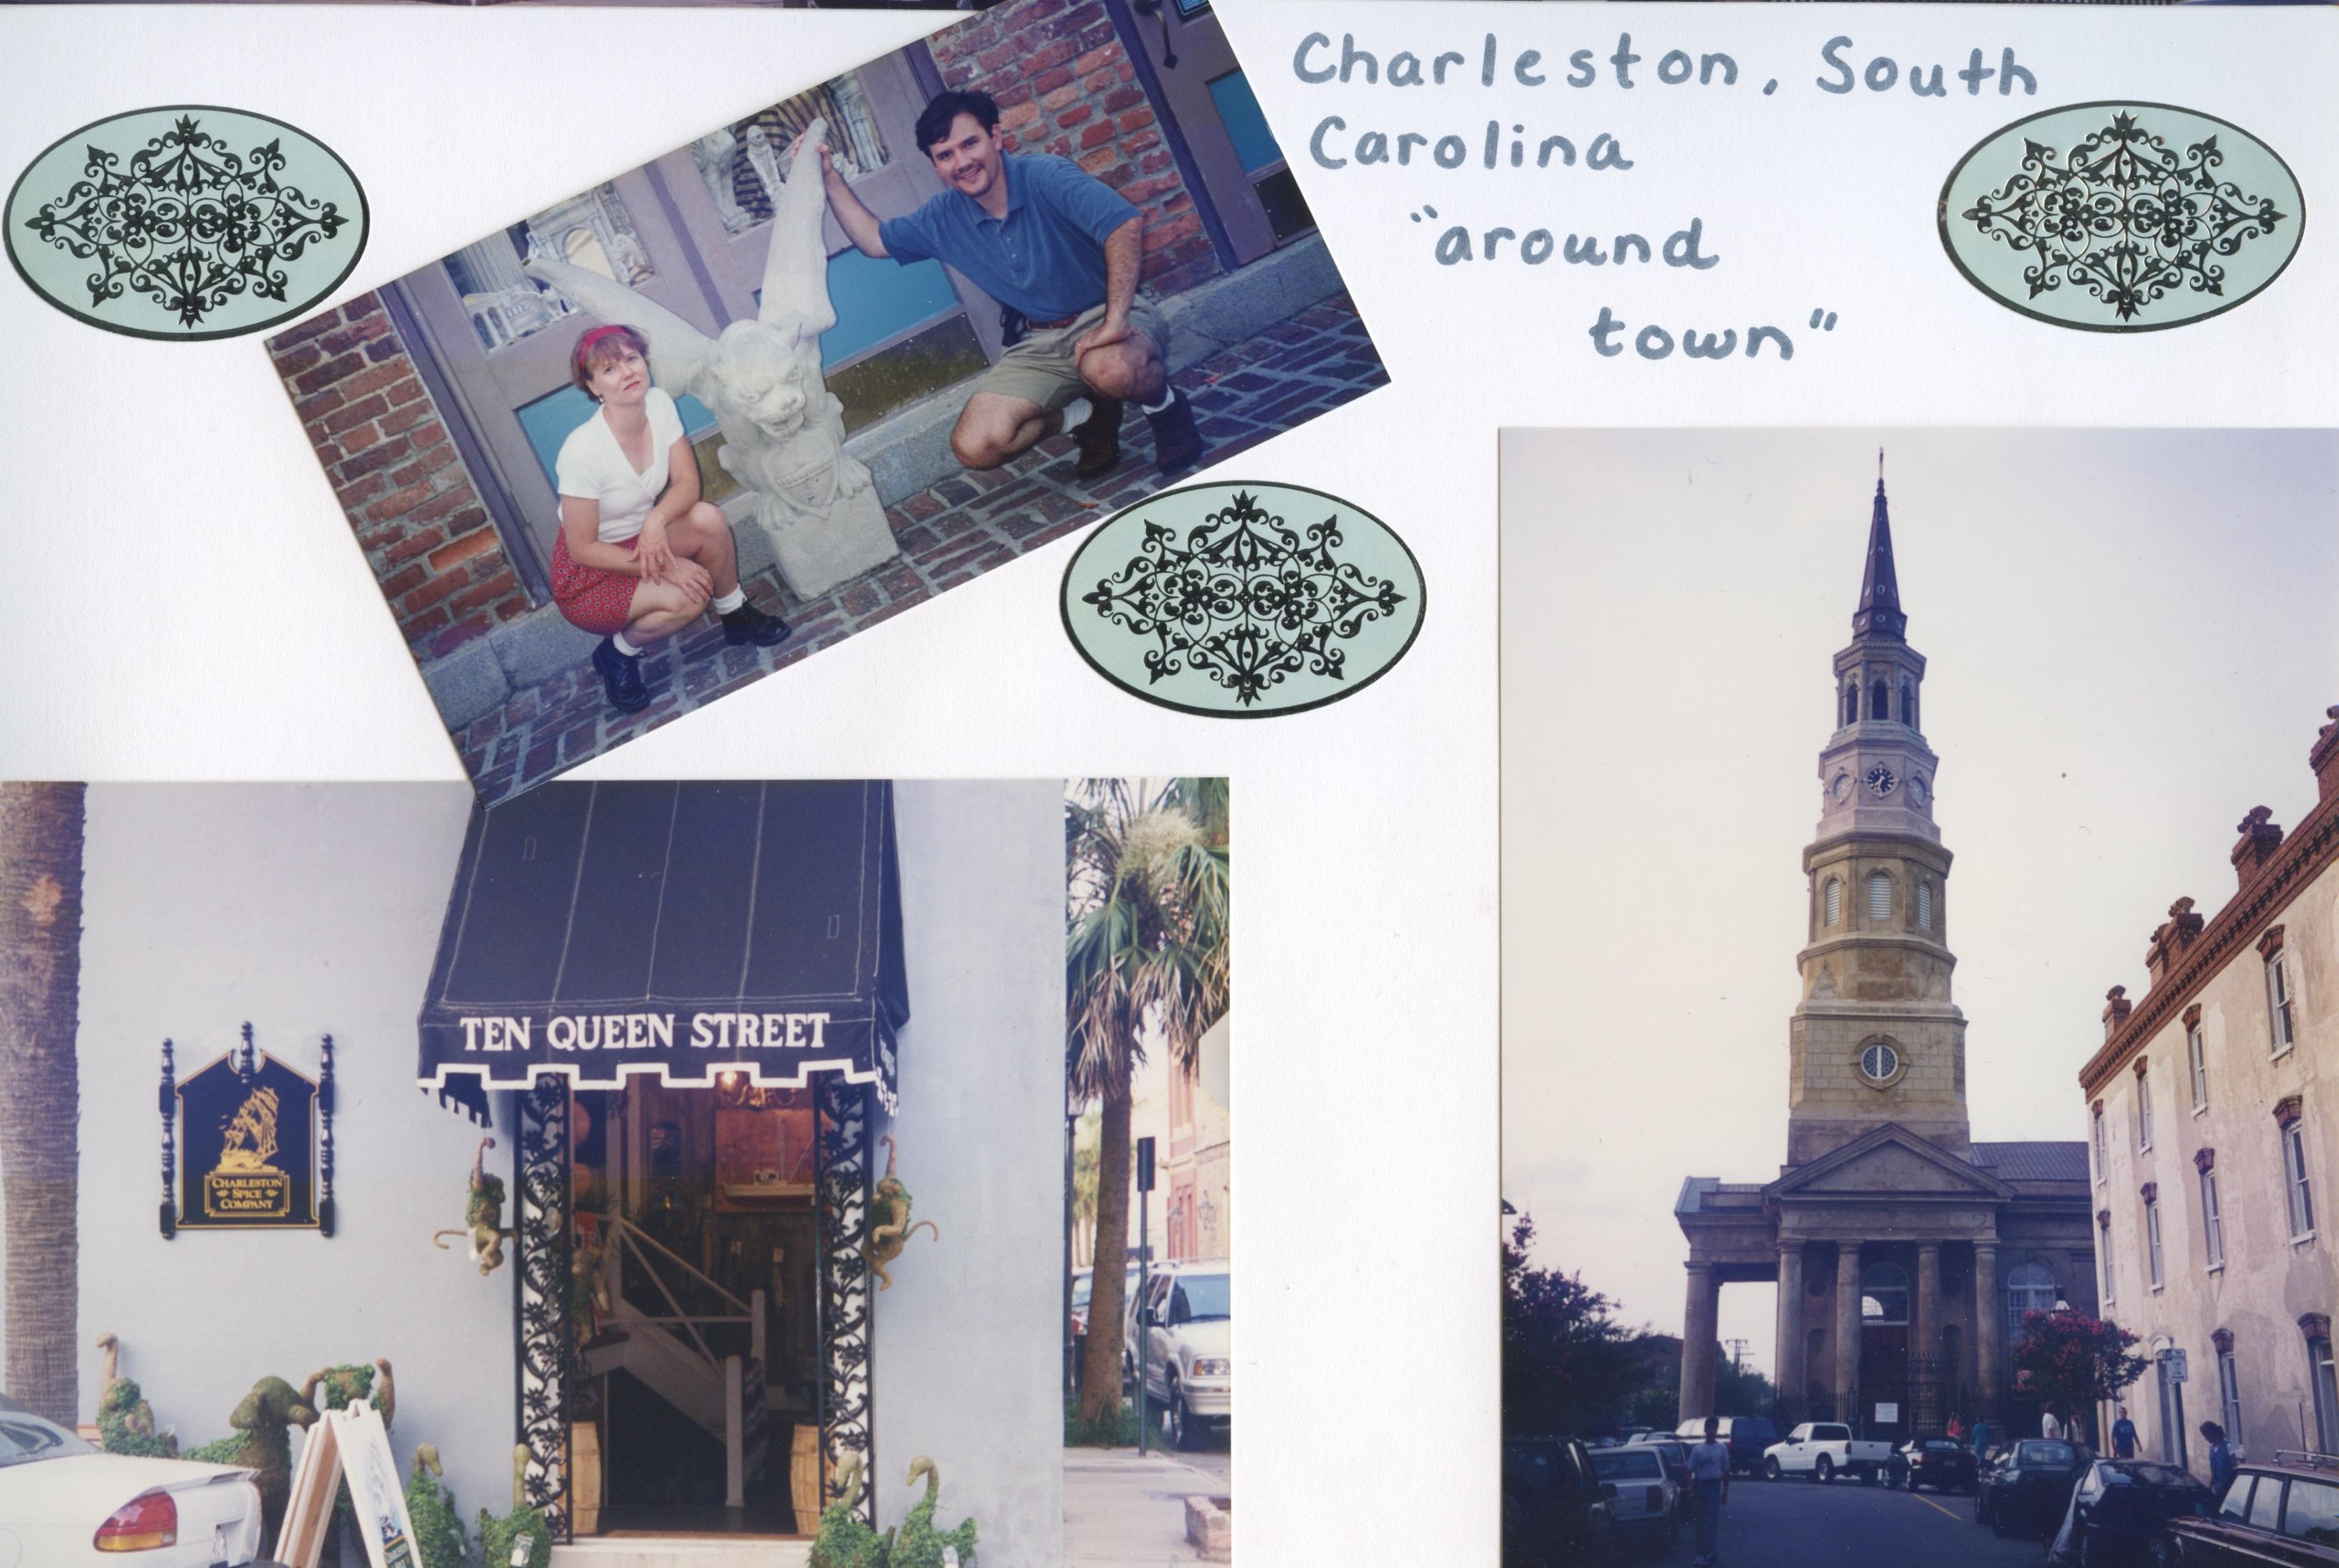 charleston-sc-trip-1995